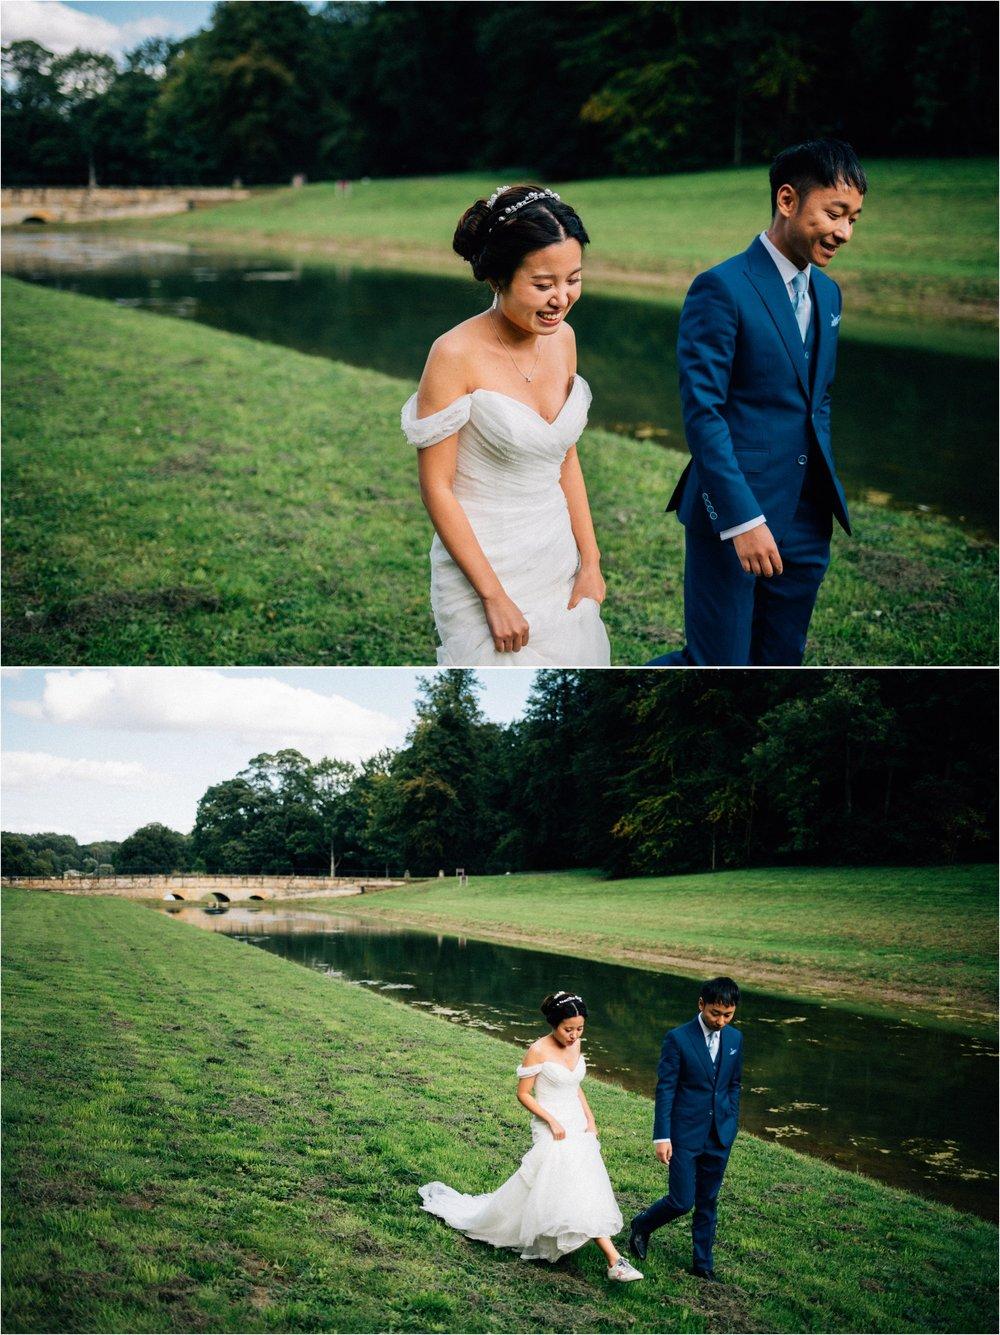 York city elopement wedding photographer_0192.jpg